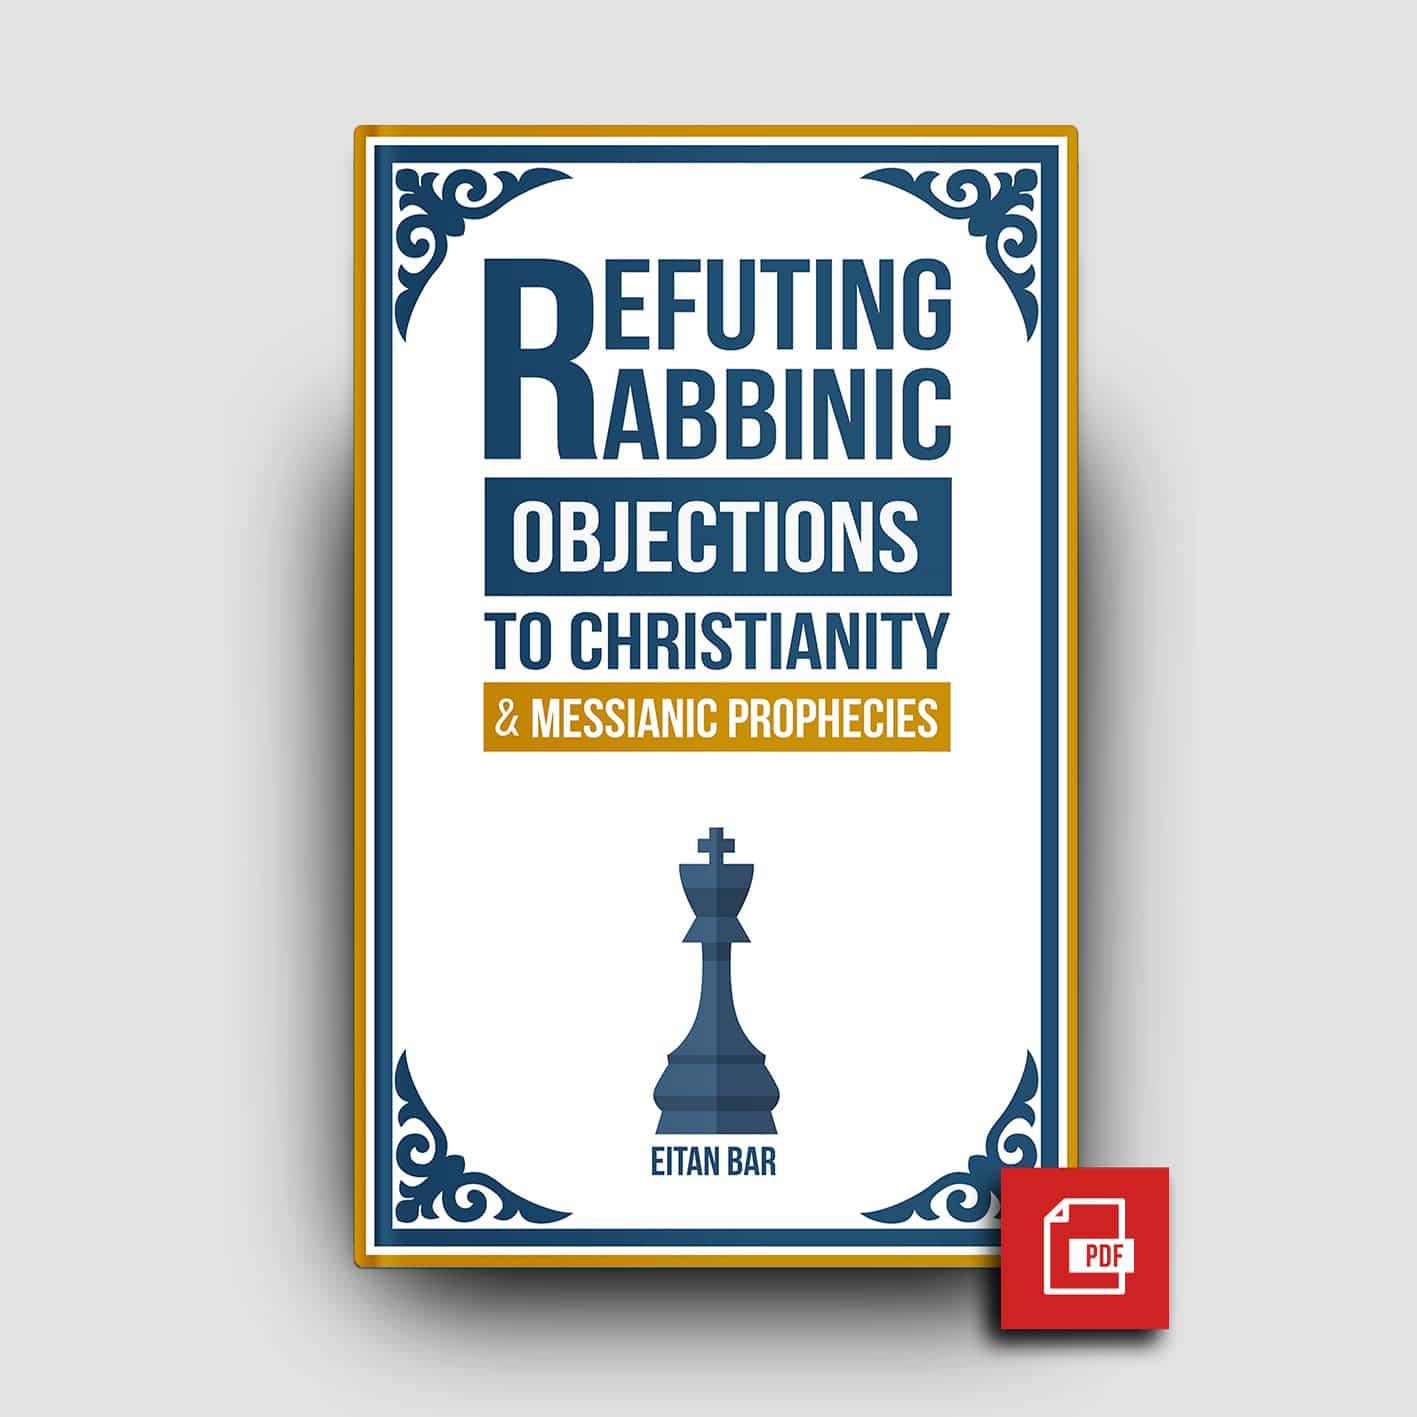 Refuting Rabbinic Objections to Christianity & Messianic Prophecies (PDF)